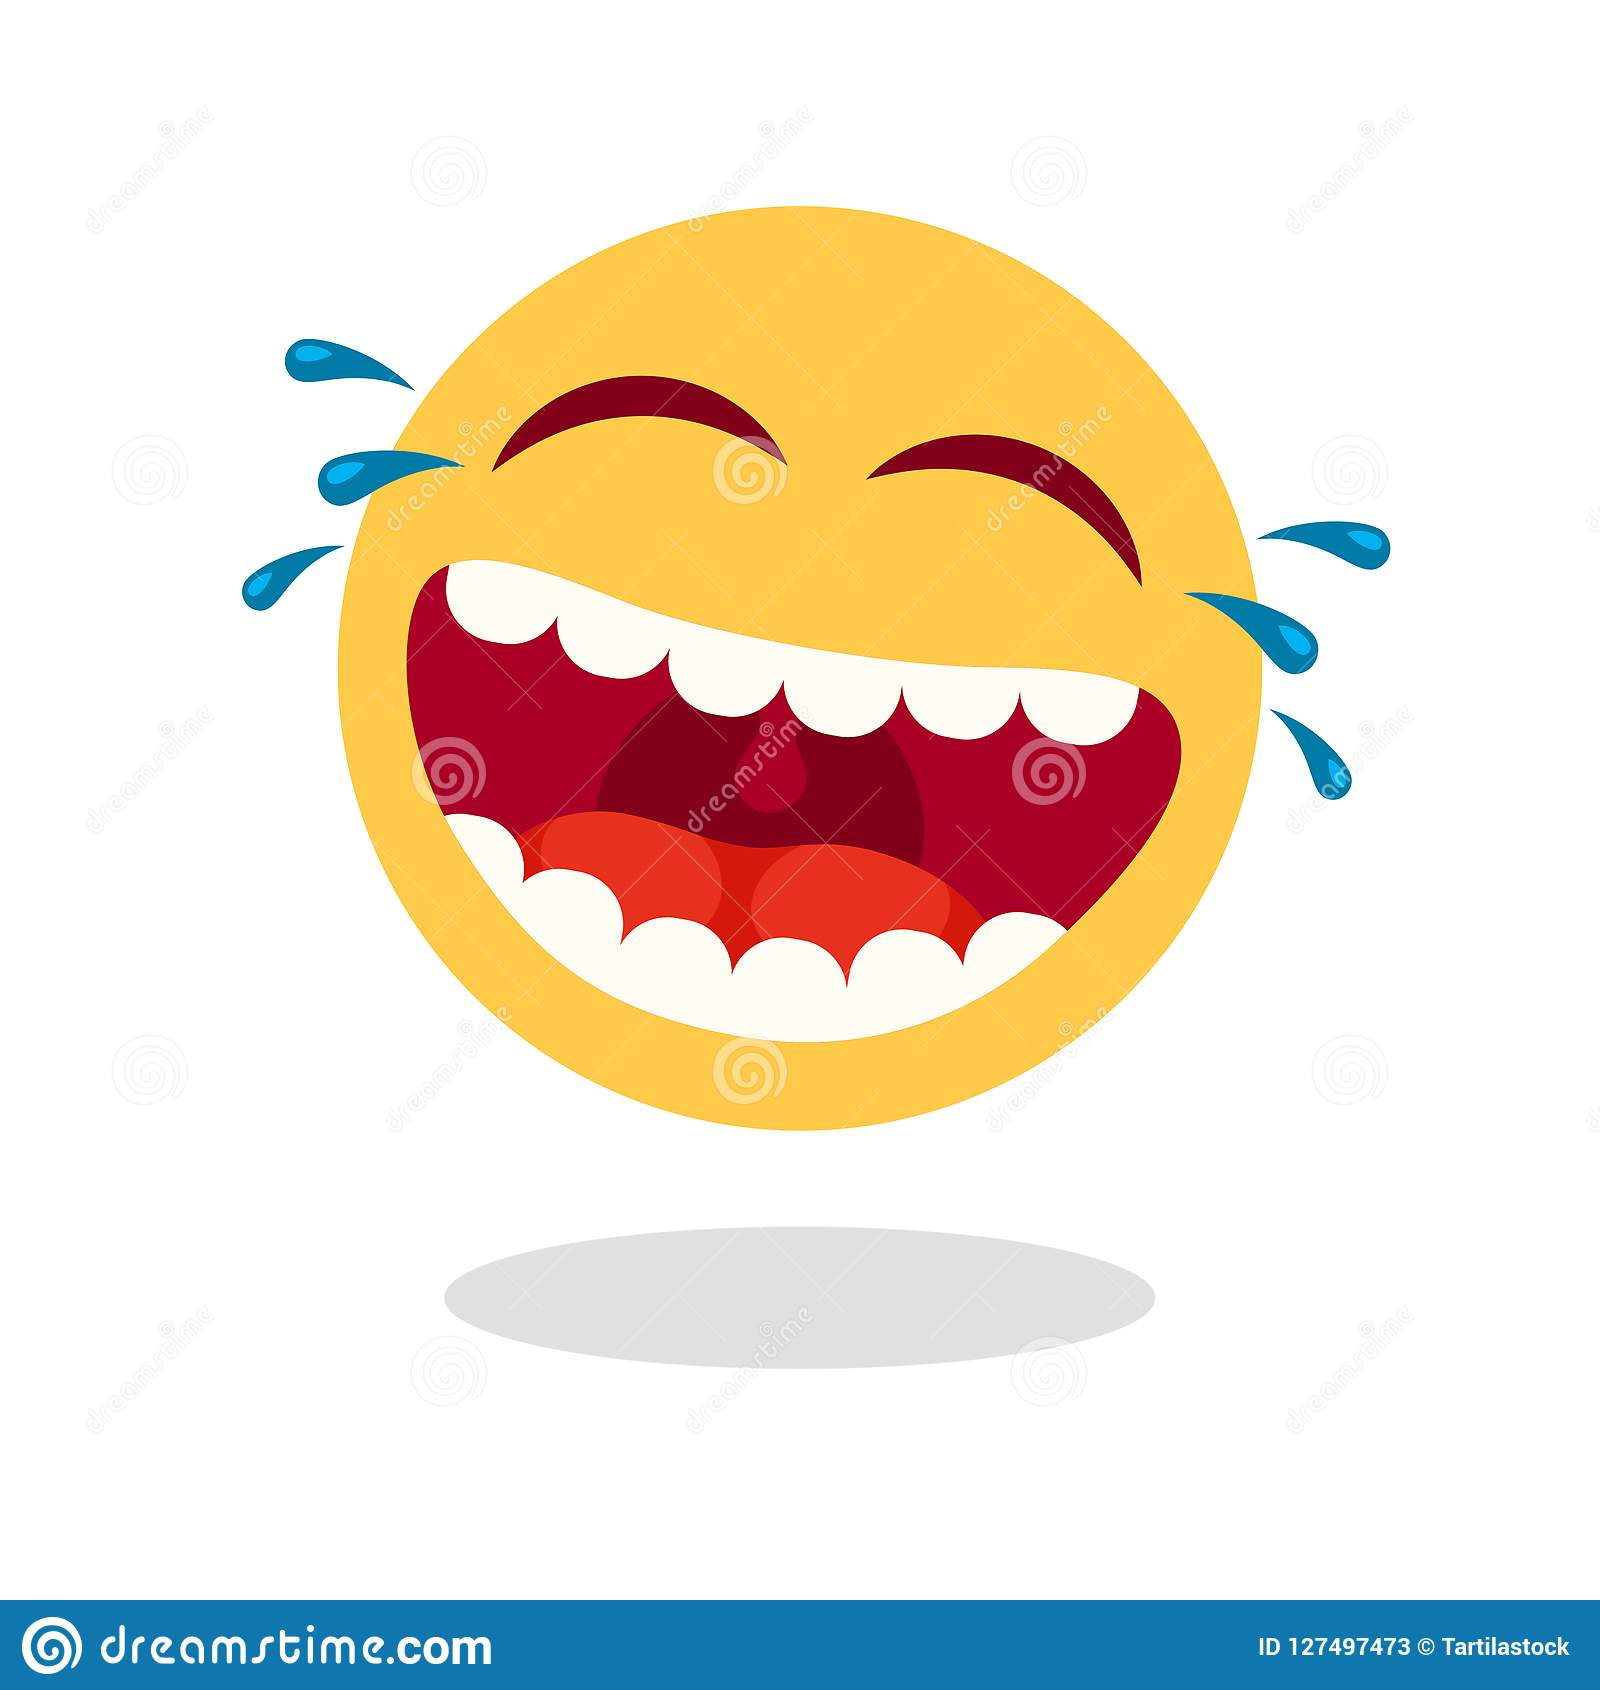 Lol Emoticon Stock Illustrations 4 955 Lol Emoticon Stock Illustrations Vectors Clipart Dreamstime